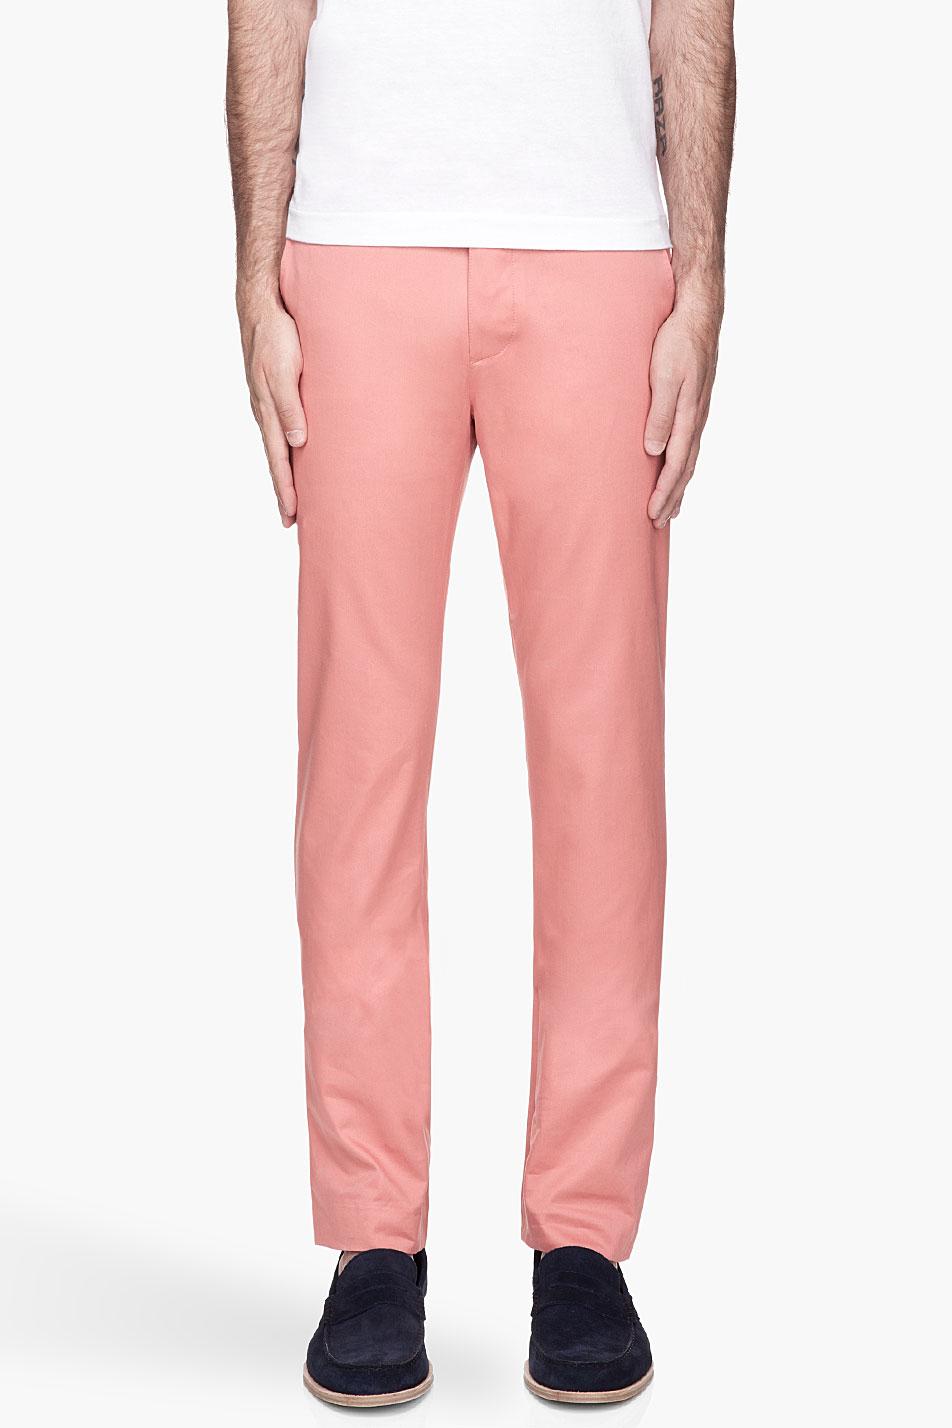 3d071ed6f932e Shipley & Halmos Salmon Pink Belmont Trousers for men